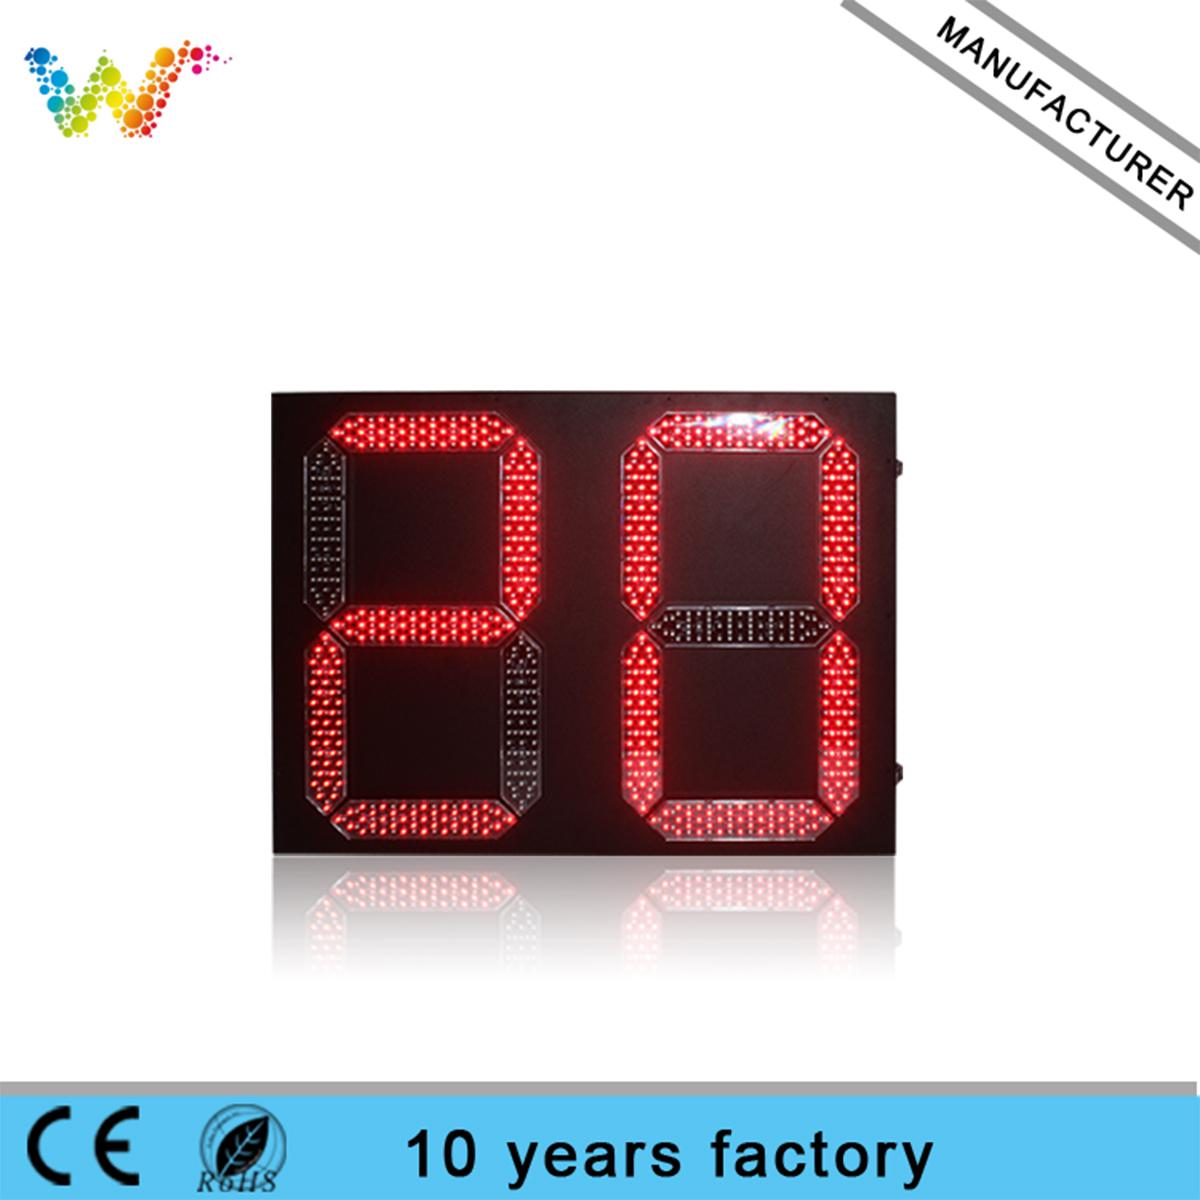 800*600mm Outdoor 2 digital Led Traffic Light Countdown Timer